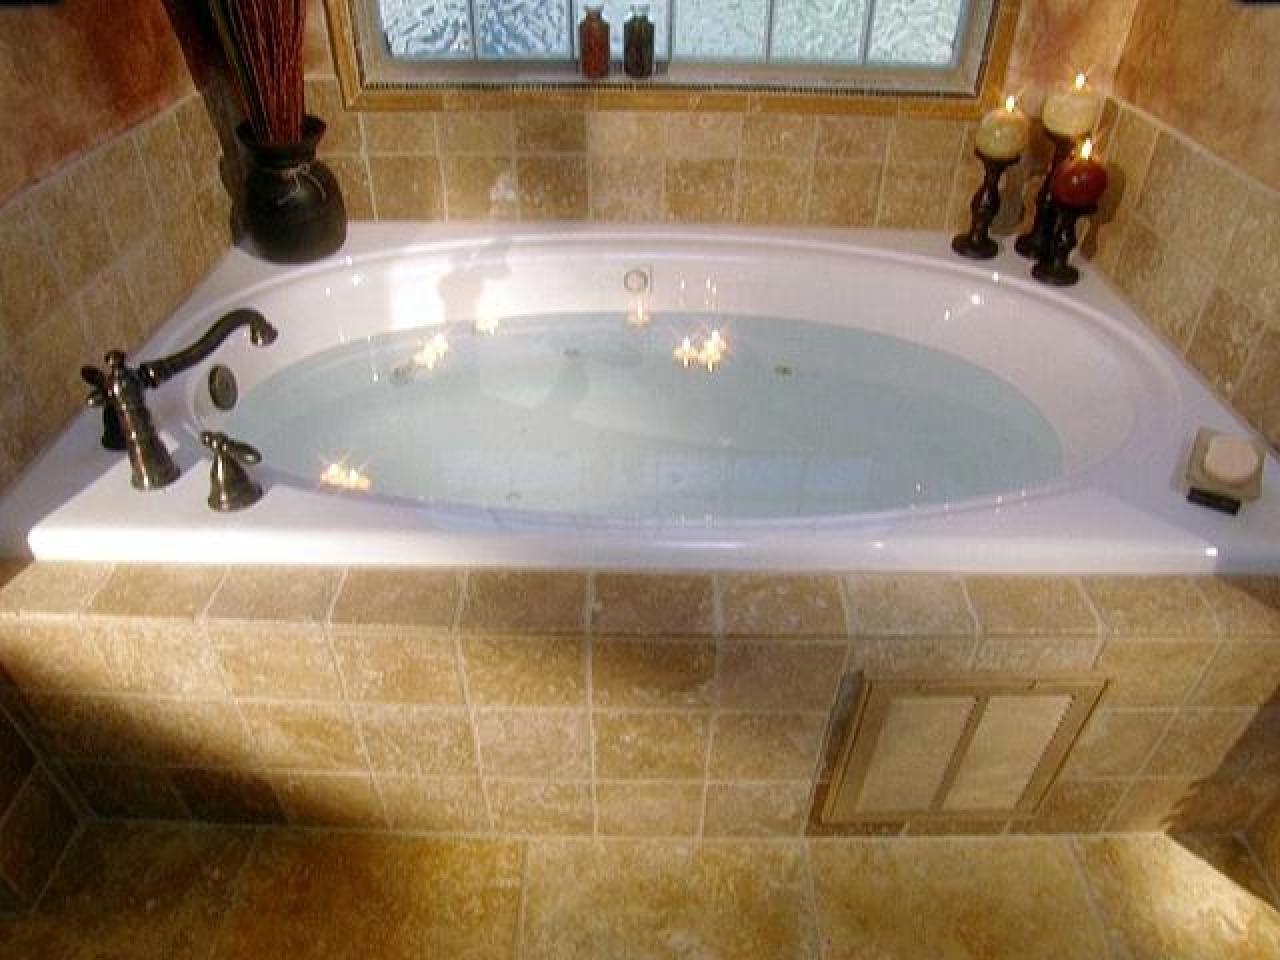 Shop Smart for a Shower and Bathtub | New Bathroom | Pinterest ...